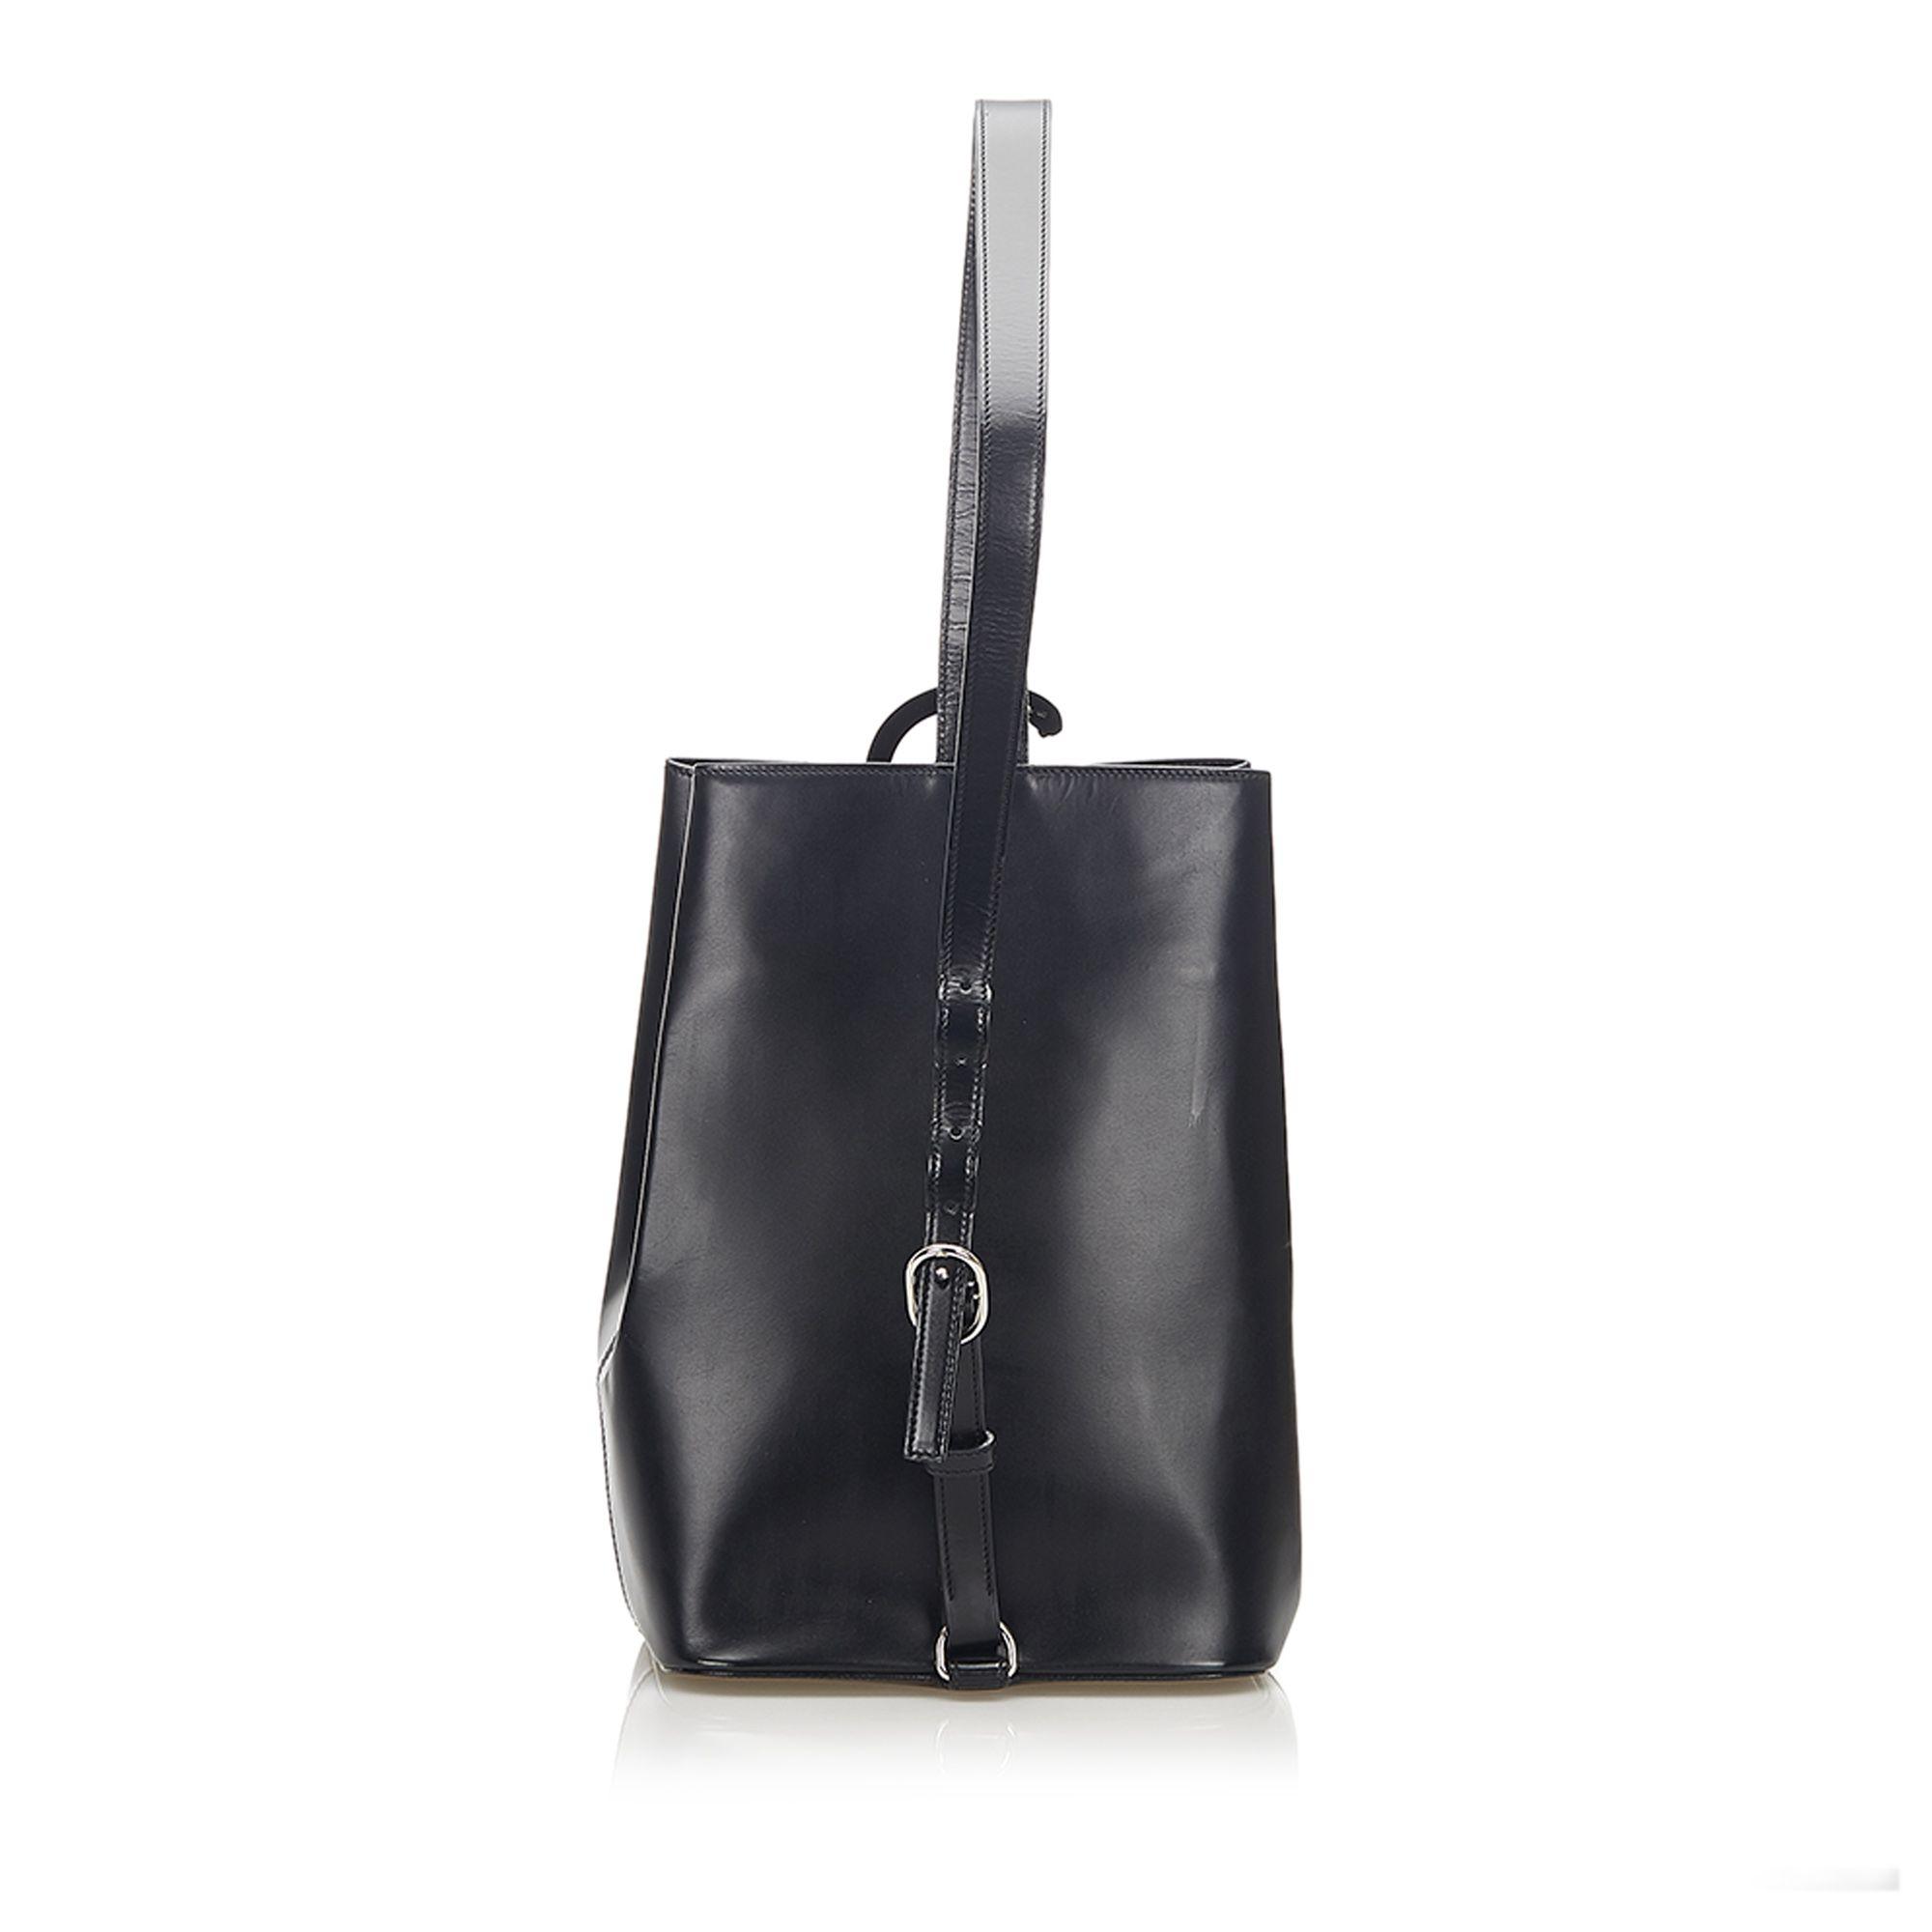 Vintage Cartier Panthere Leather Backpack Black